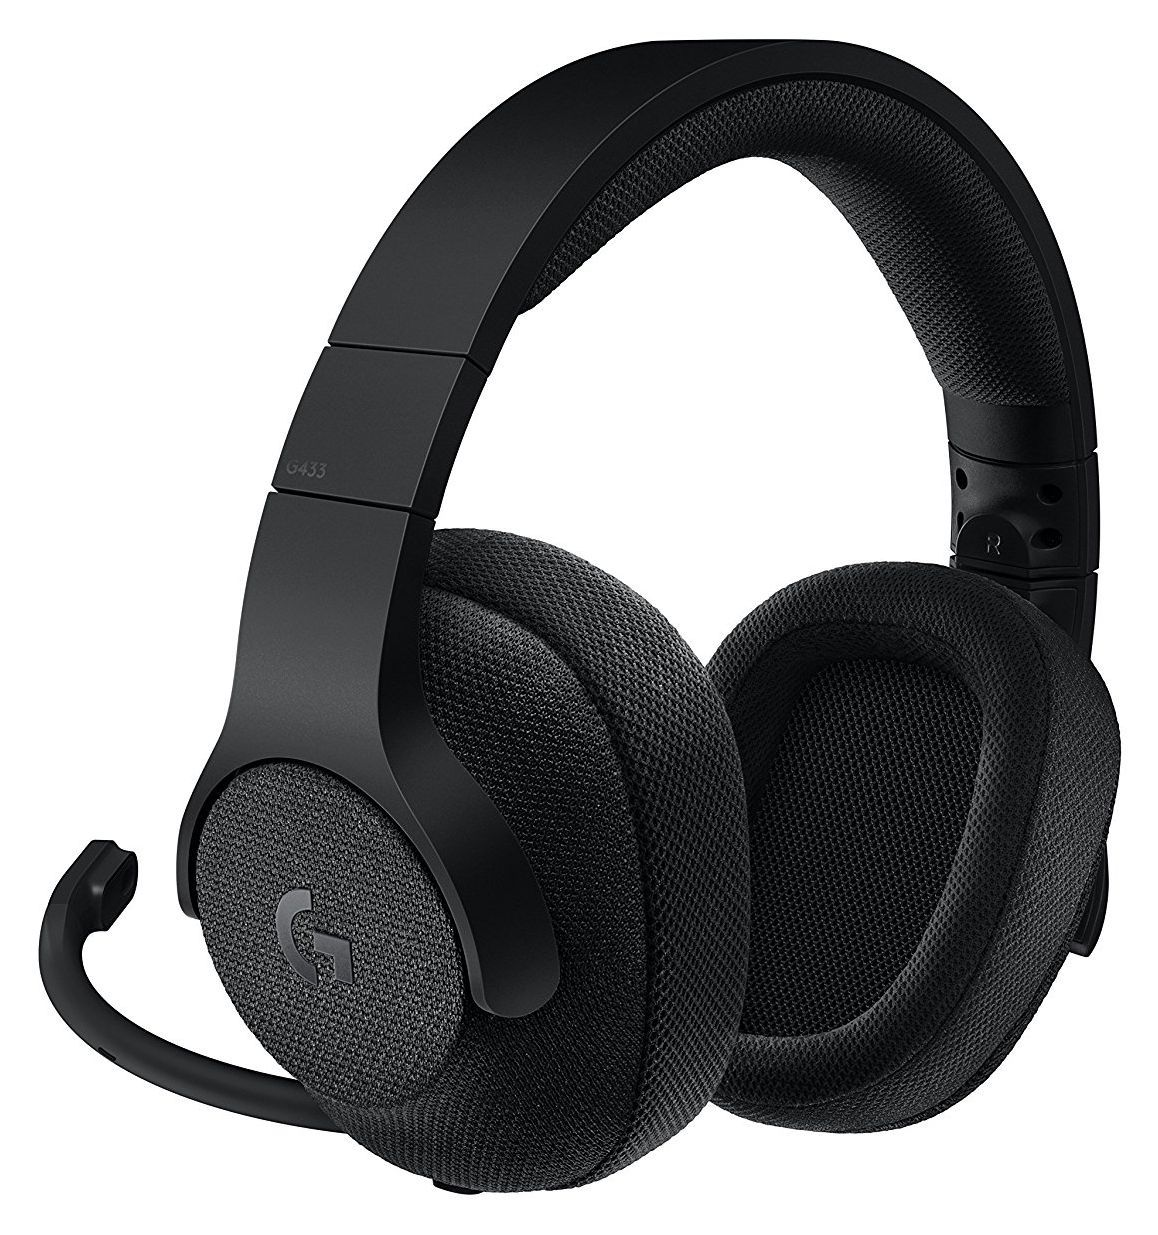 Logitech G433 Gaming Headset black (разопакован) - 1